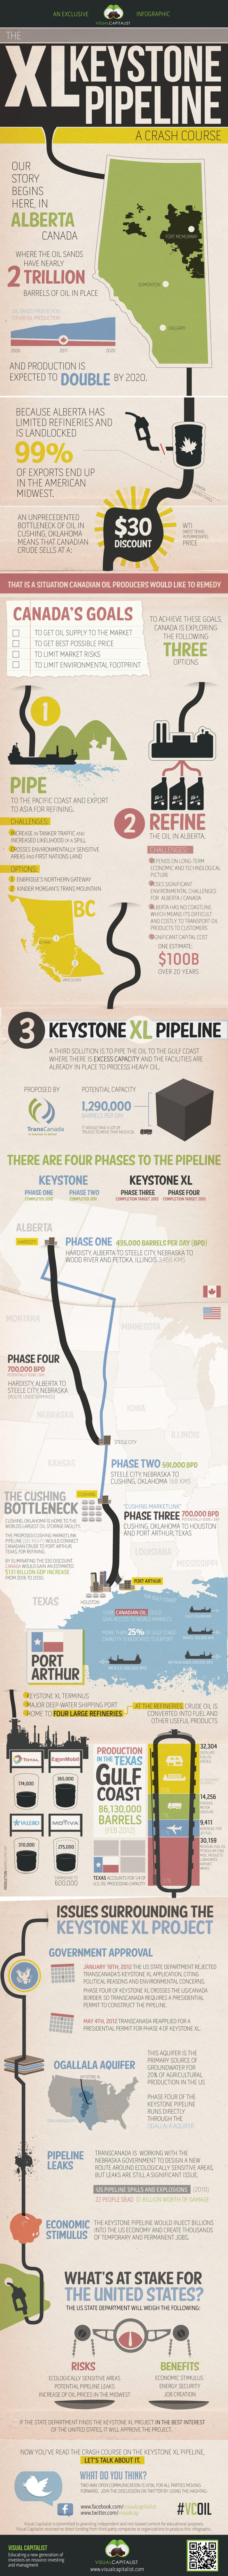 keystone-xl-infographic-oil